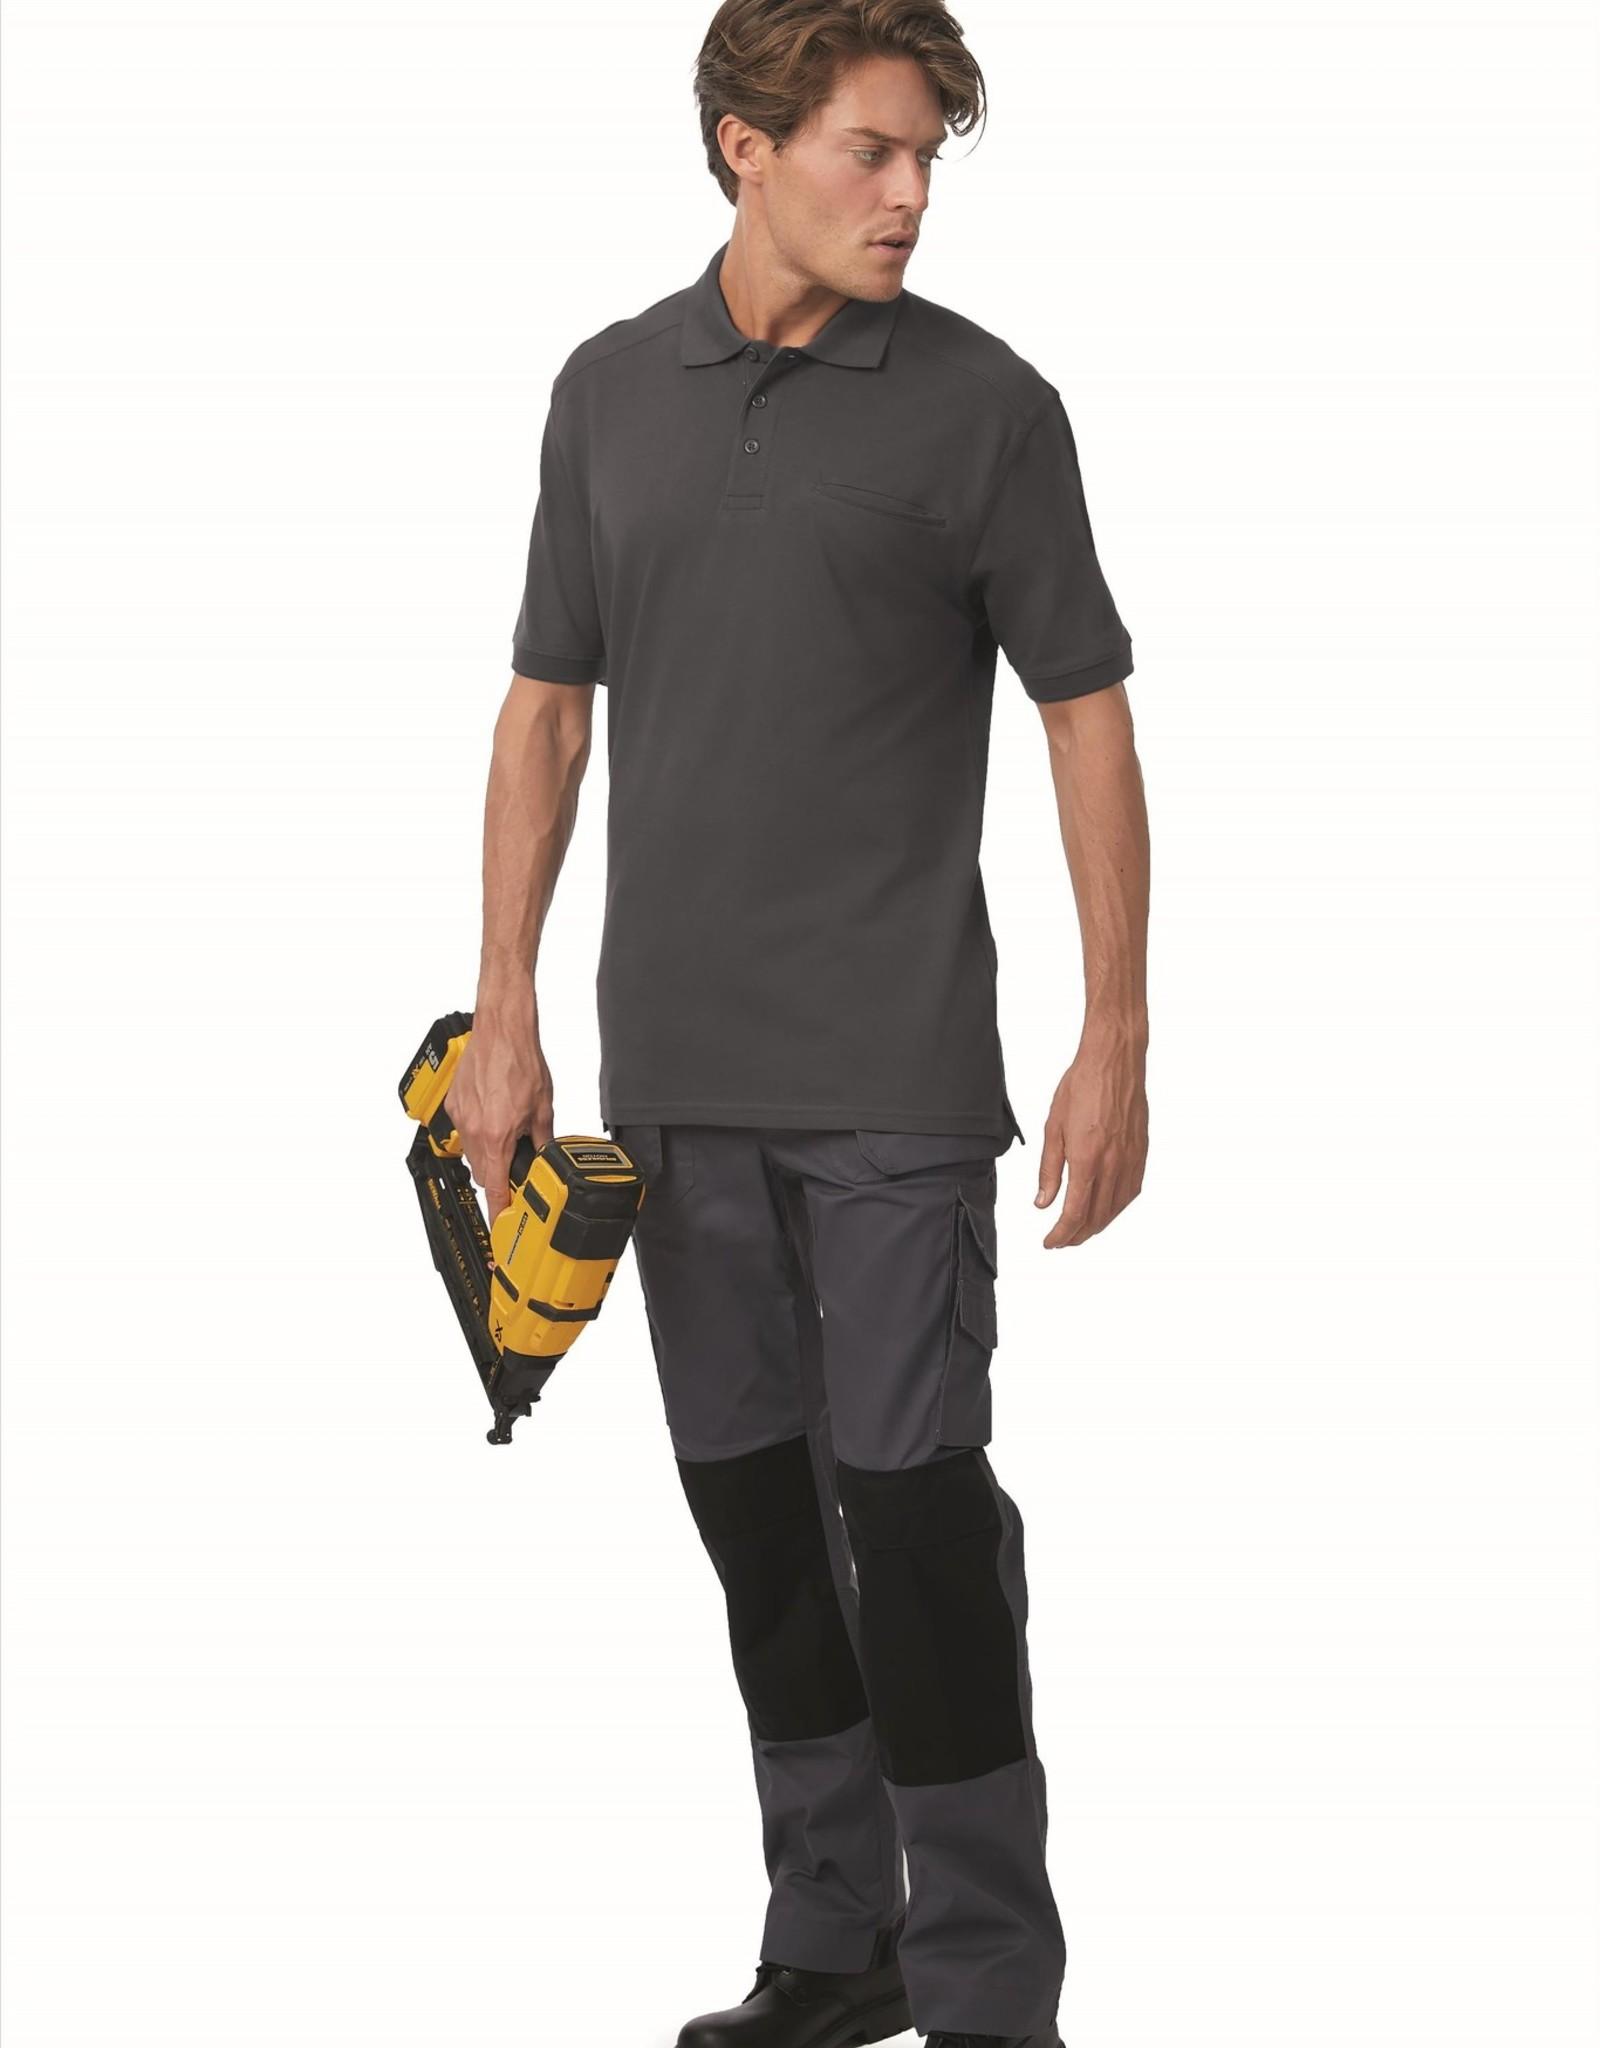 B&C Workwear POLOSHIRT katoen navy